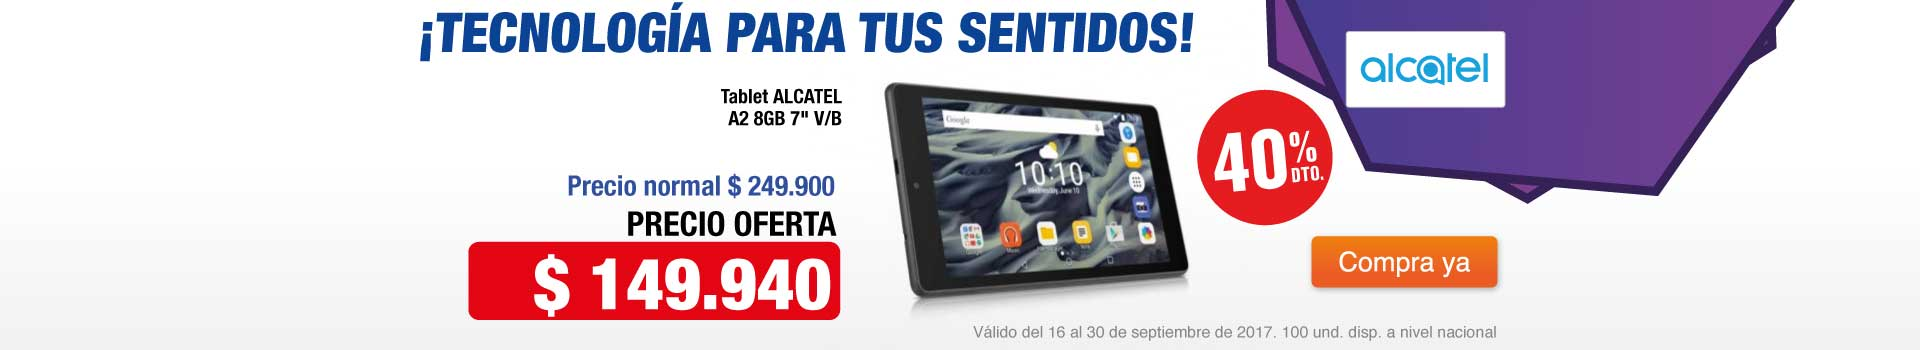 CAT AK-1-tablets-Tablet ALCATEL A2 8GB 7